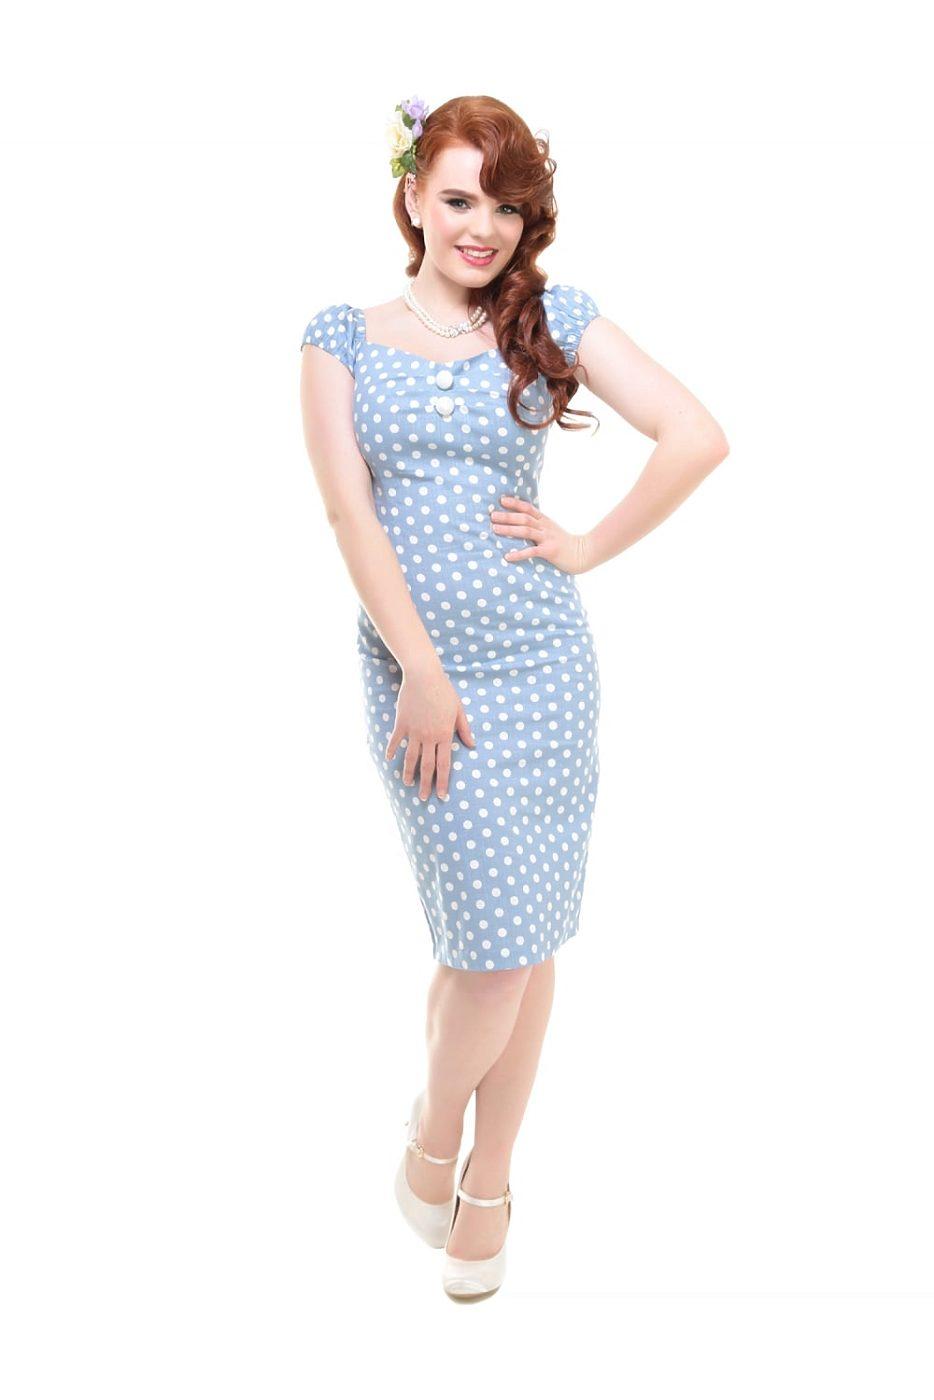 671d268ce10 Světle modré šaty s puntíky Collectif Dolores